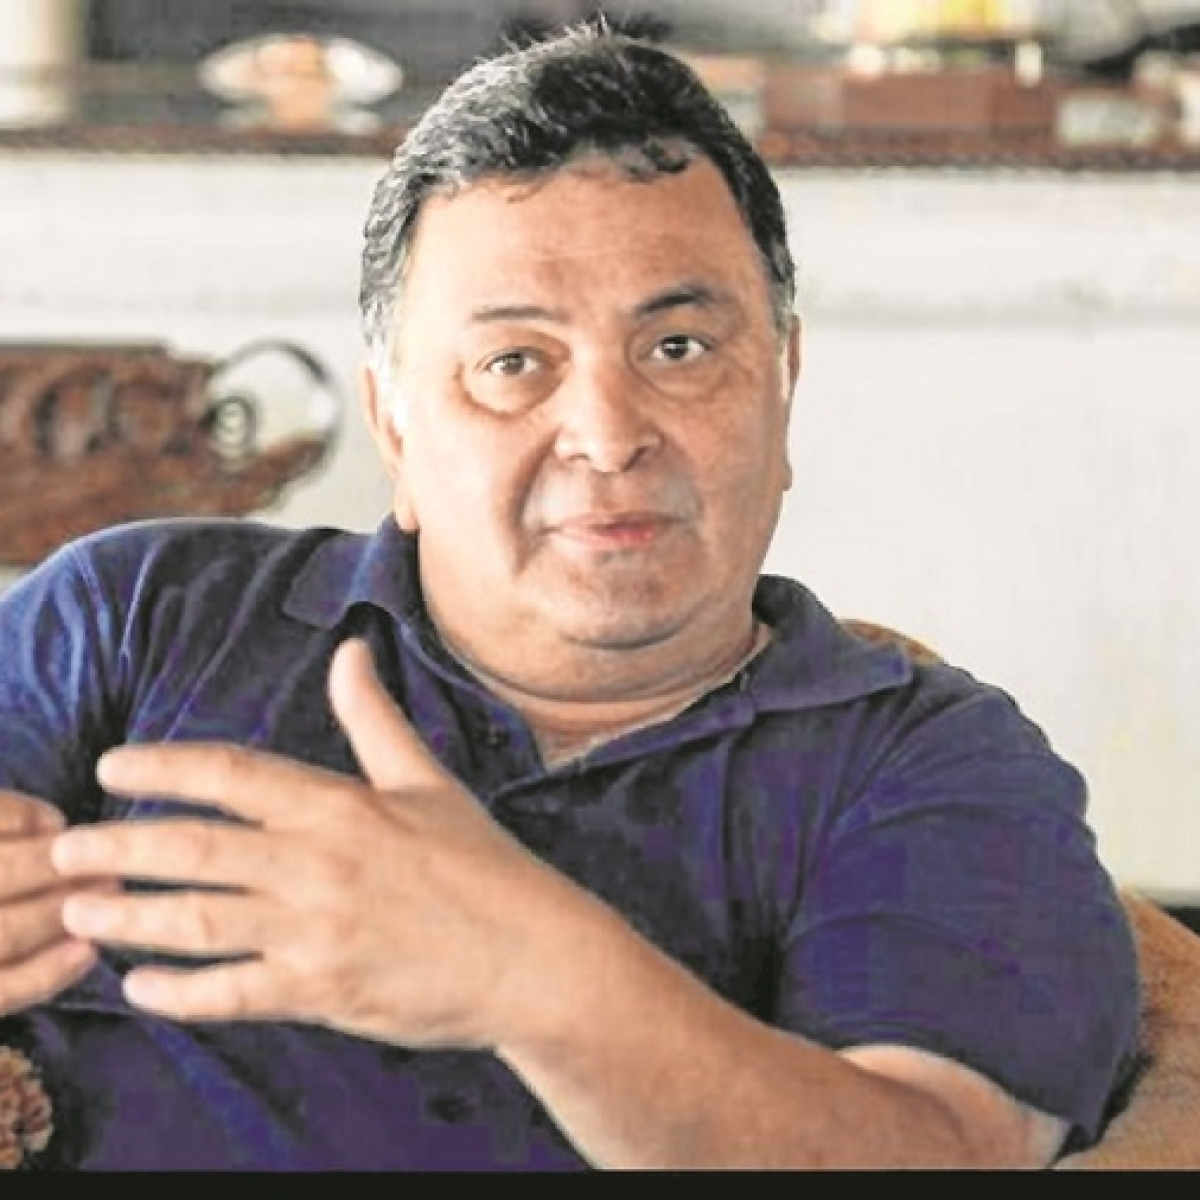 2020 wrap up: From Rishi Kapoor to Sushant Singh Rajput, stalwarts Bollywood bid adieu to